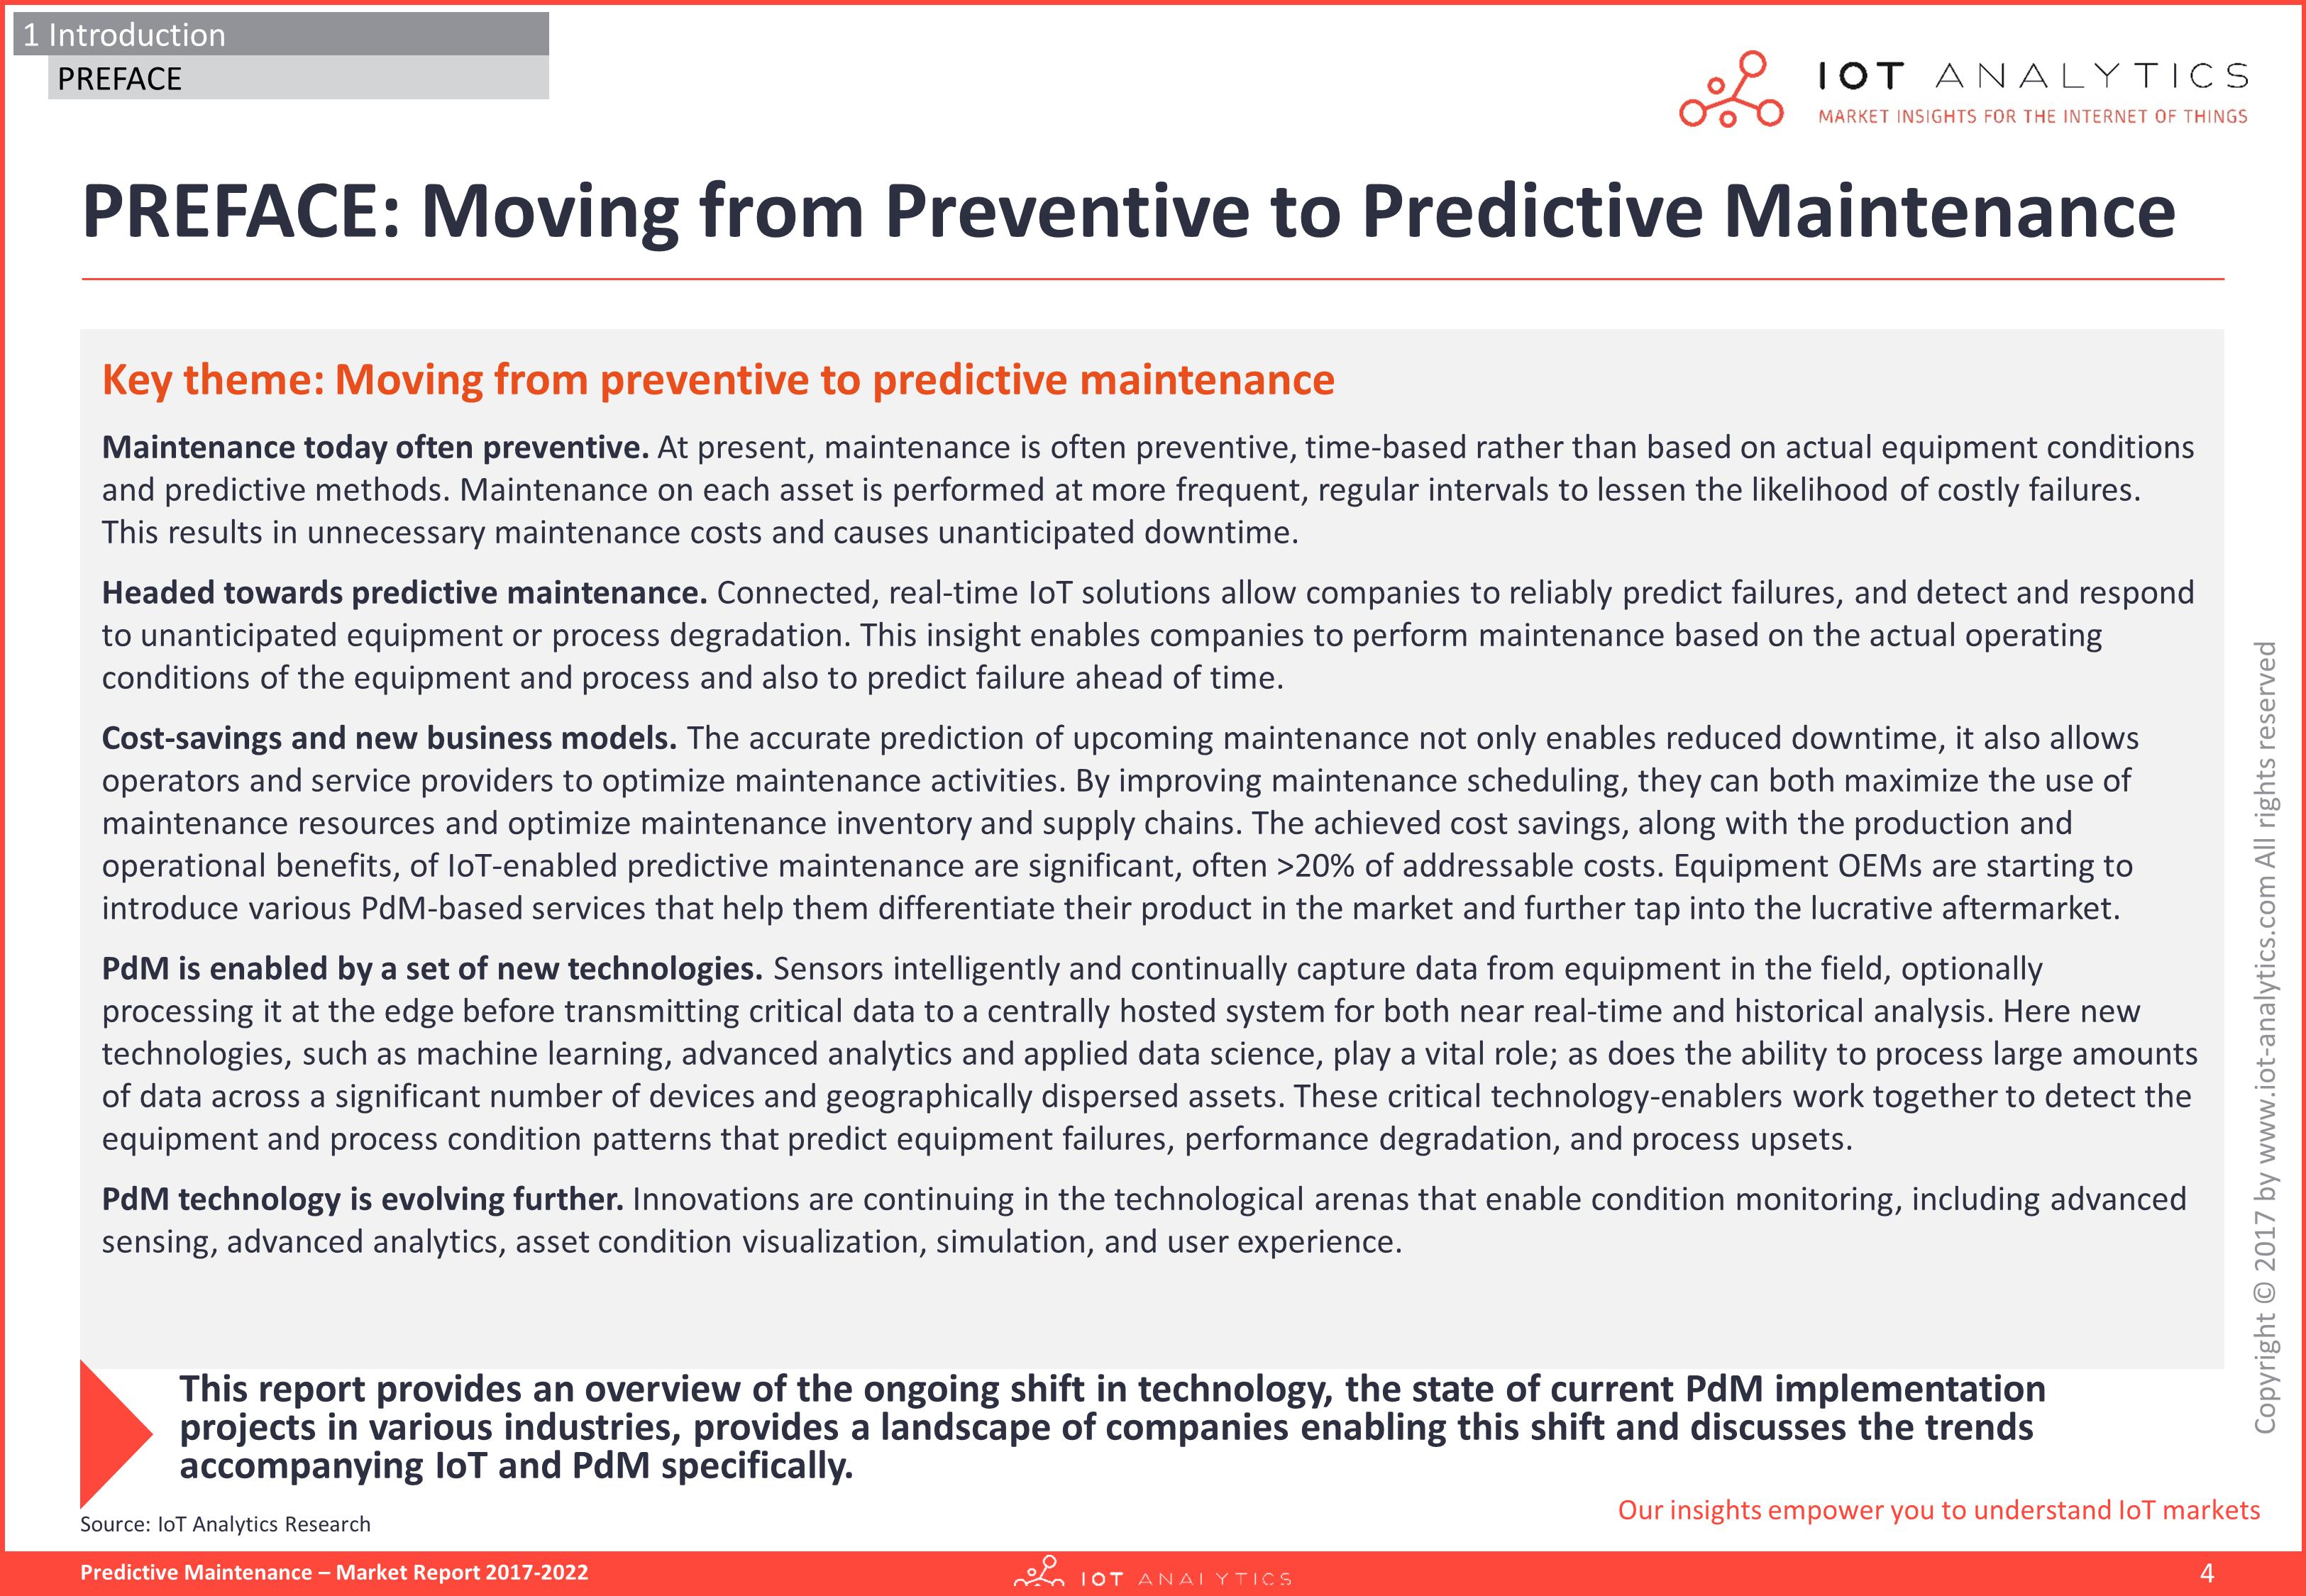 Predictive Maintenance Market Report 2017-22